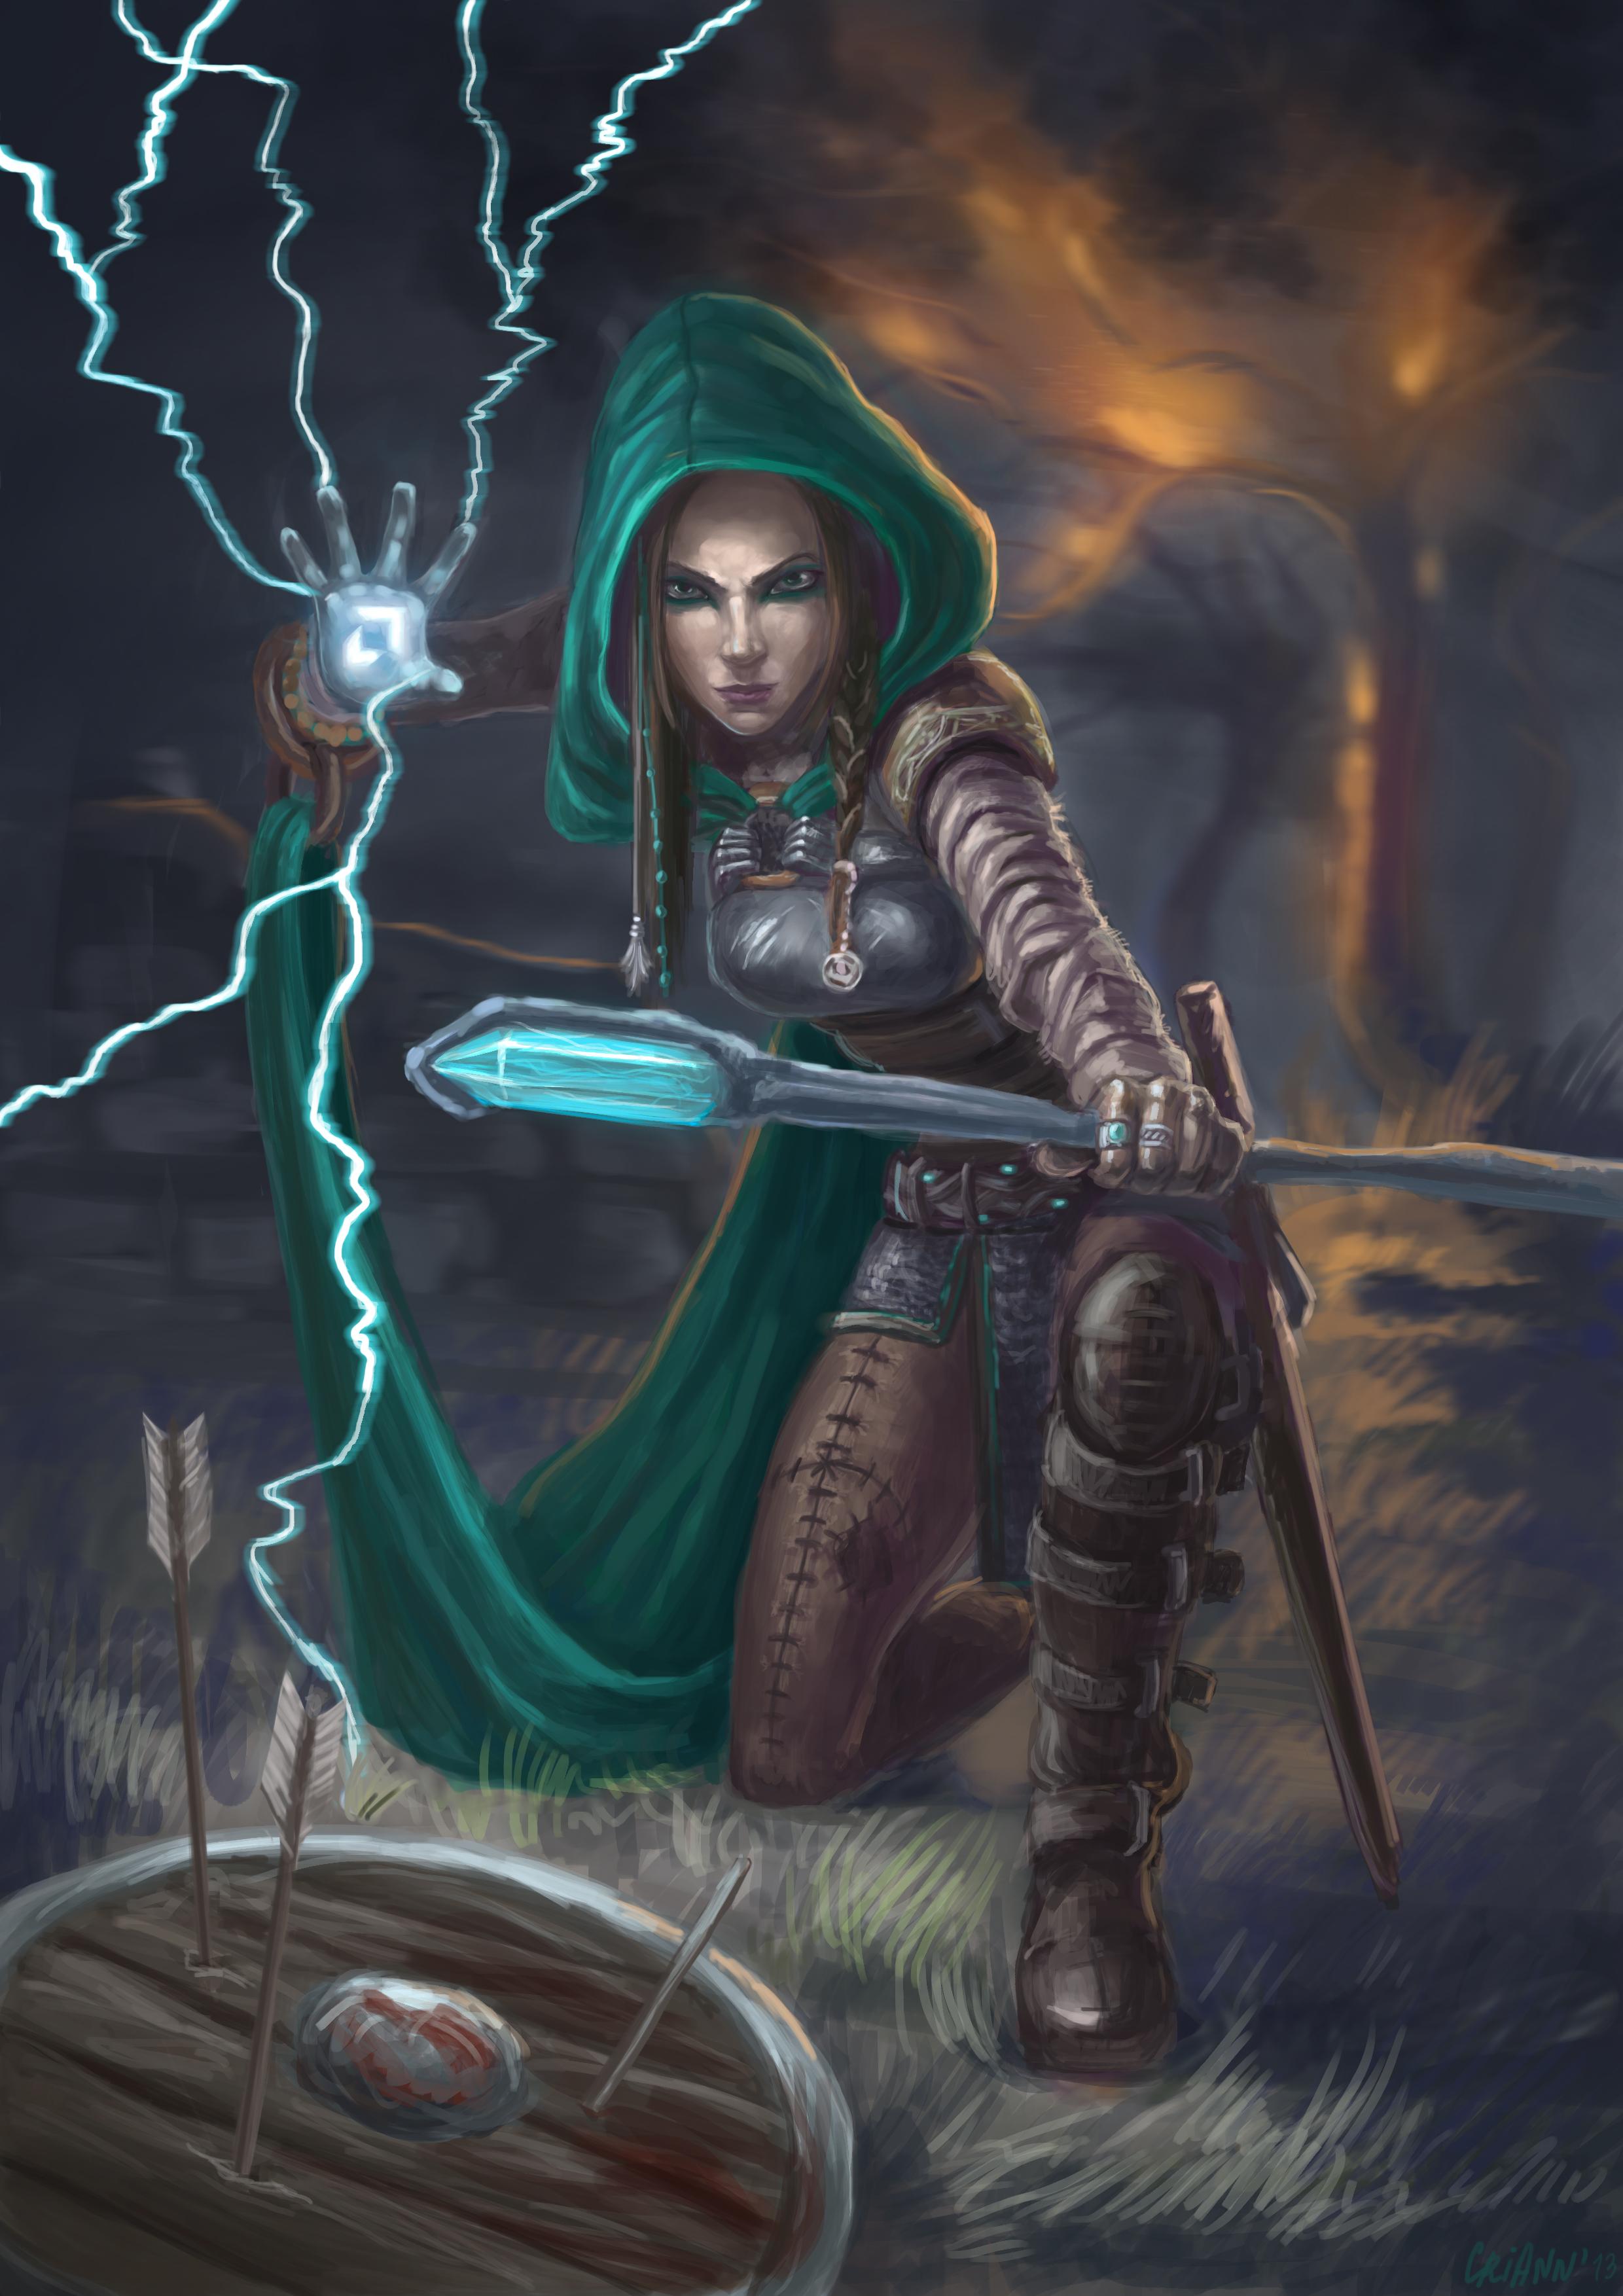 Battle mage by CriAnn